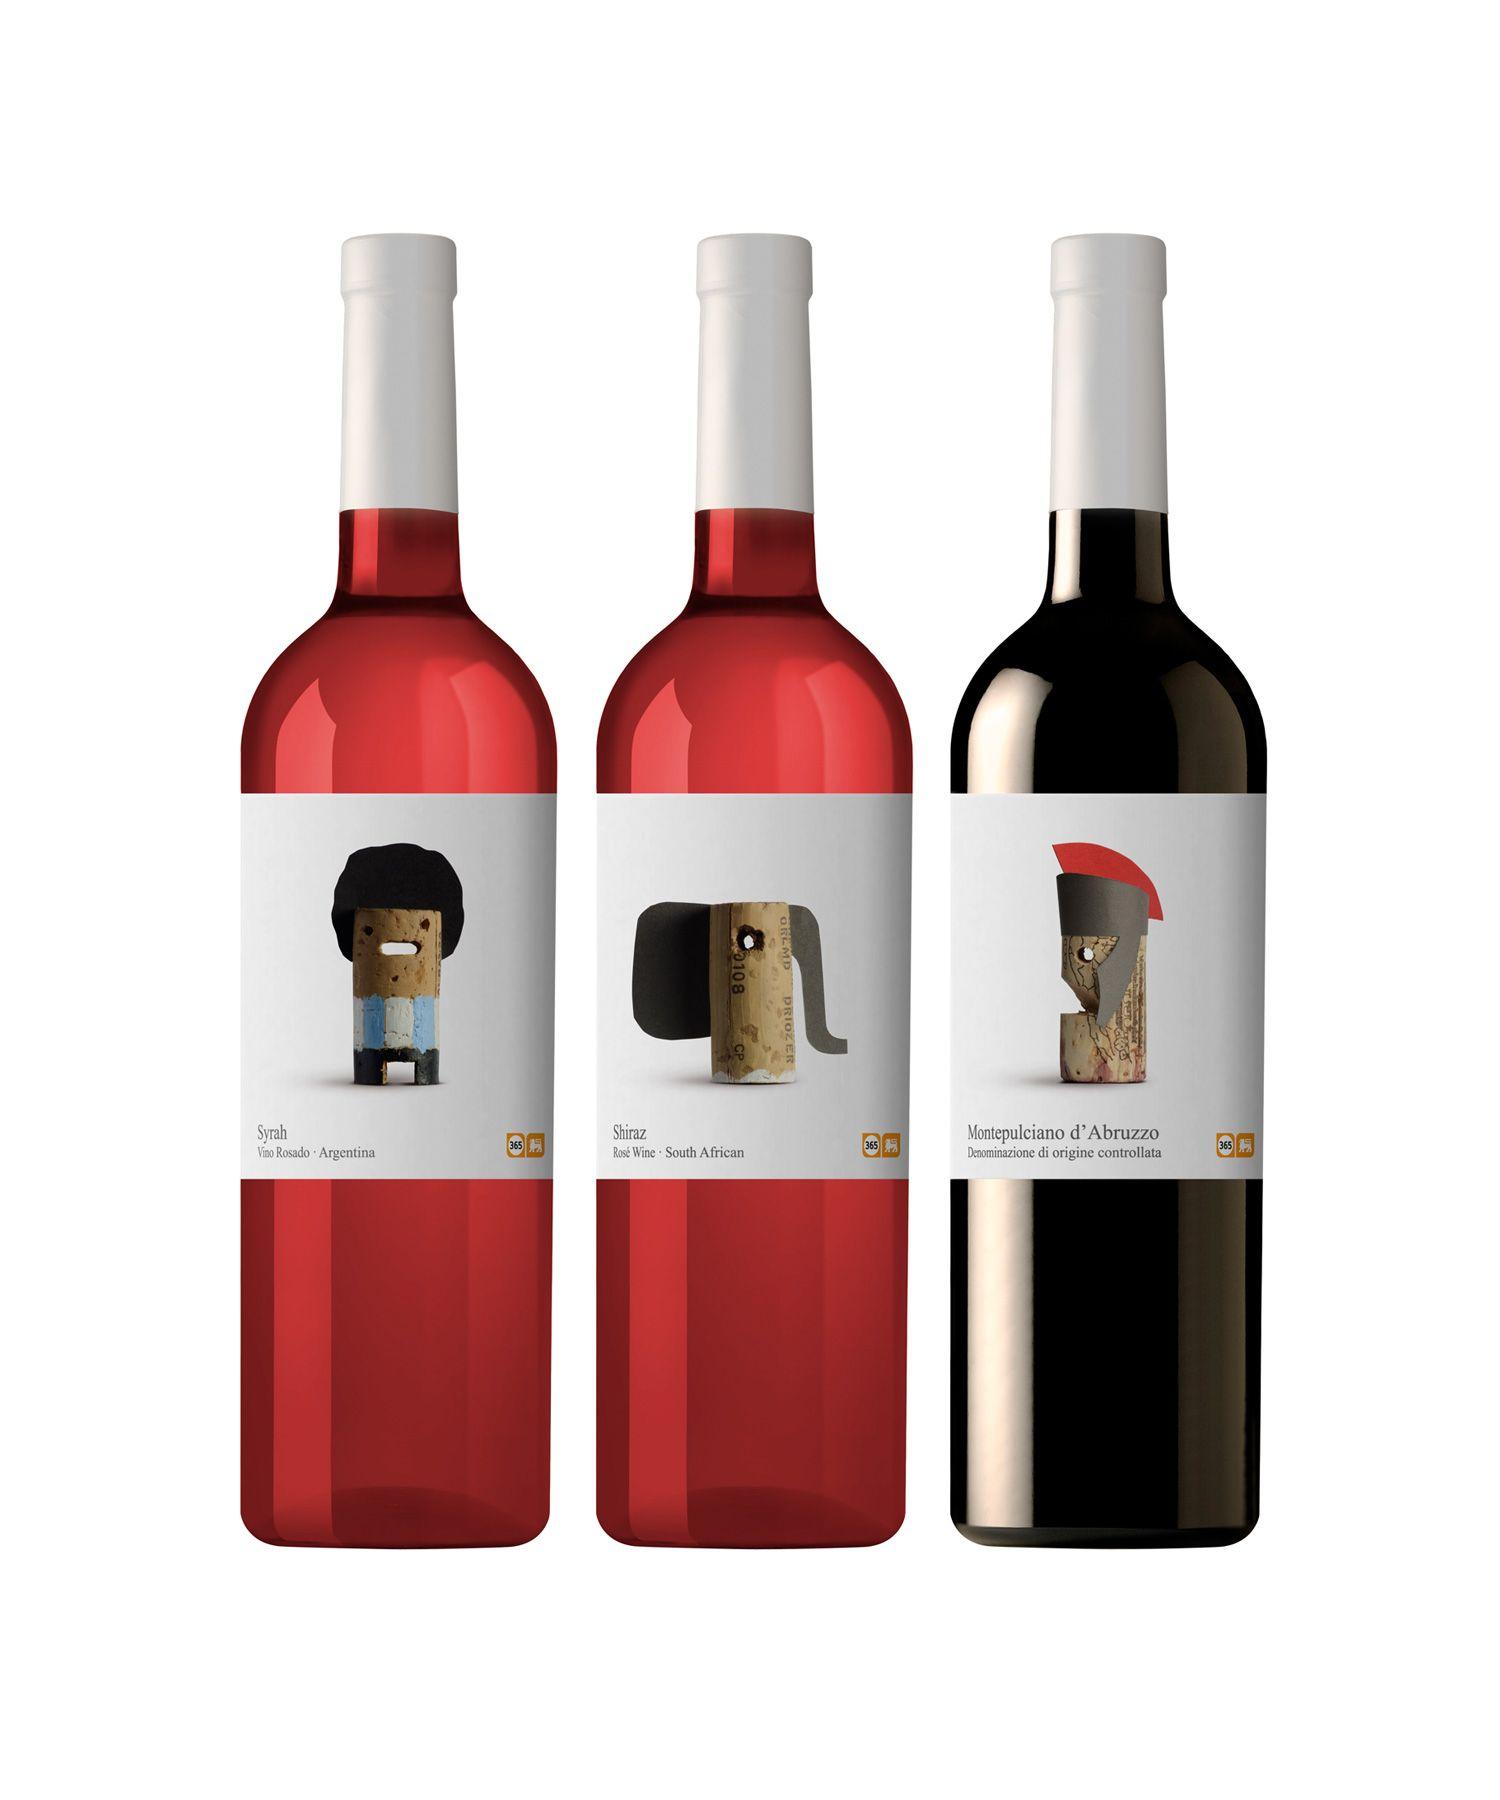 Wines Of The World Lavernia Cienfuegos Wine Label Design Wine Bottle Design Wine Packaging